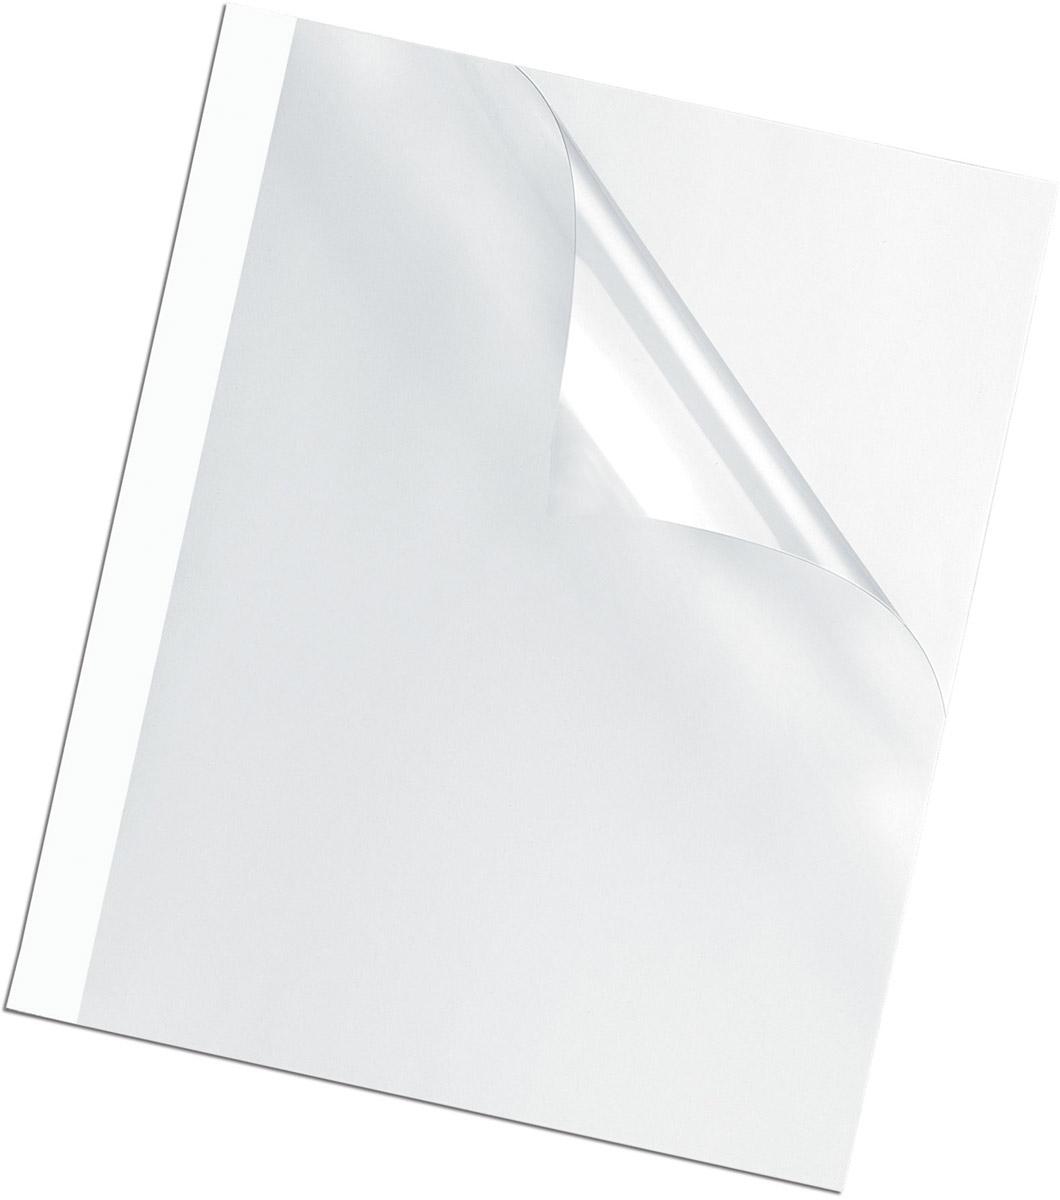 Fellowes A4 FS-53914 обложка для термопереплета, 10 мм (100 шт)